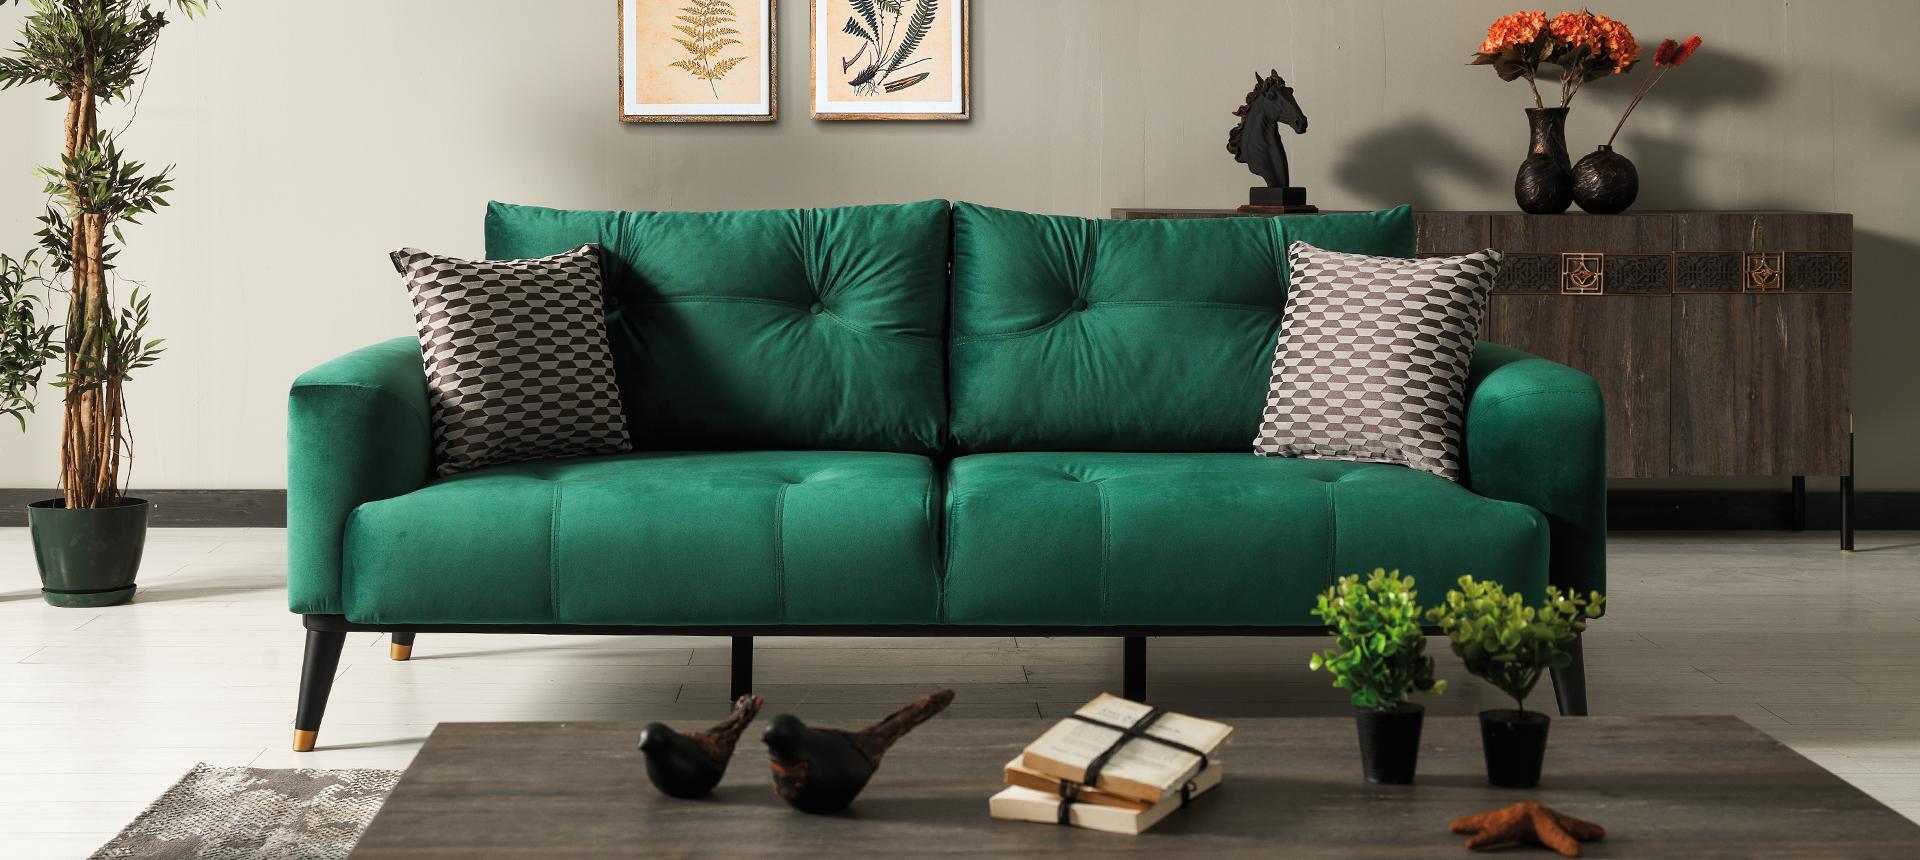 Canapea tapitata cu stofa si piele ecologica, 3 locuri, cu functie sleep pentru 1 persoana Wella Verde K1, l217xA98xH76 cm imagine